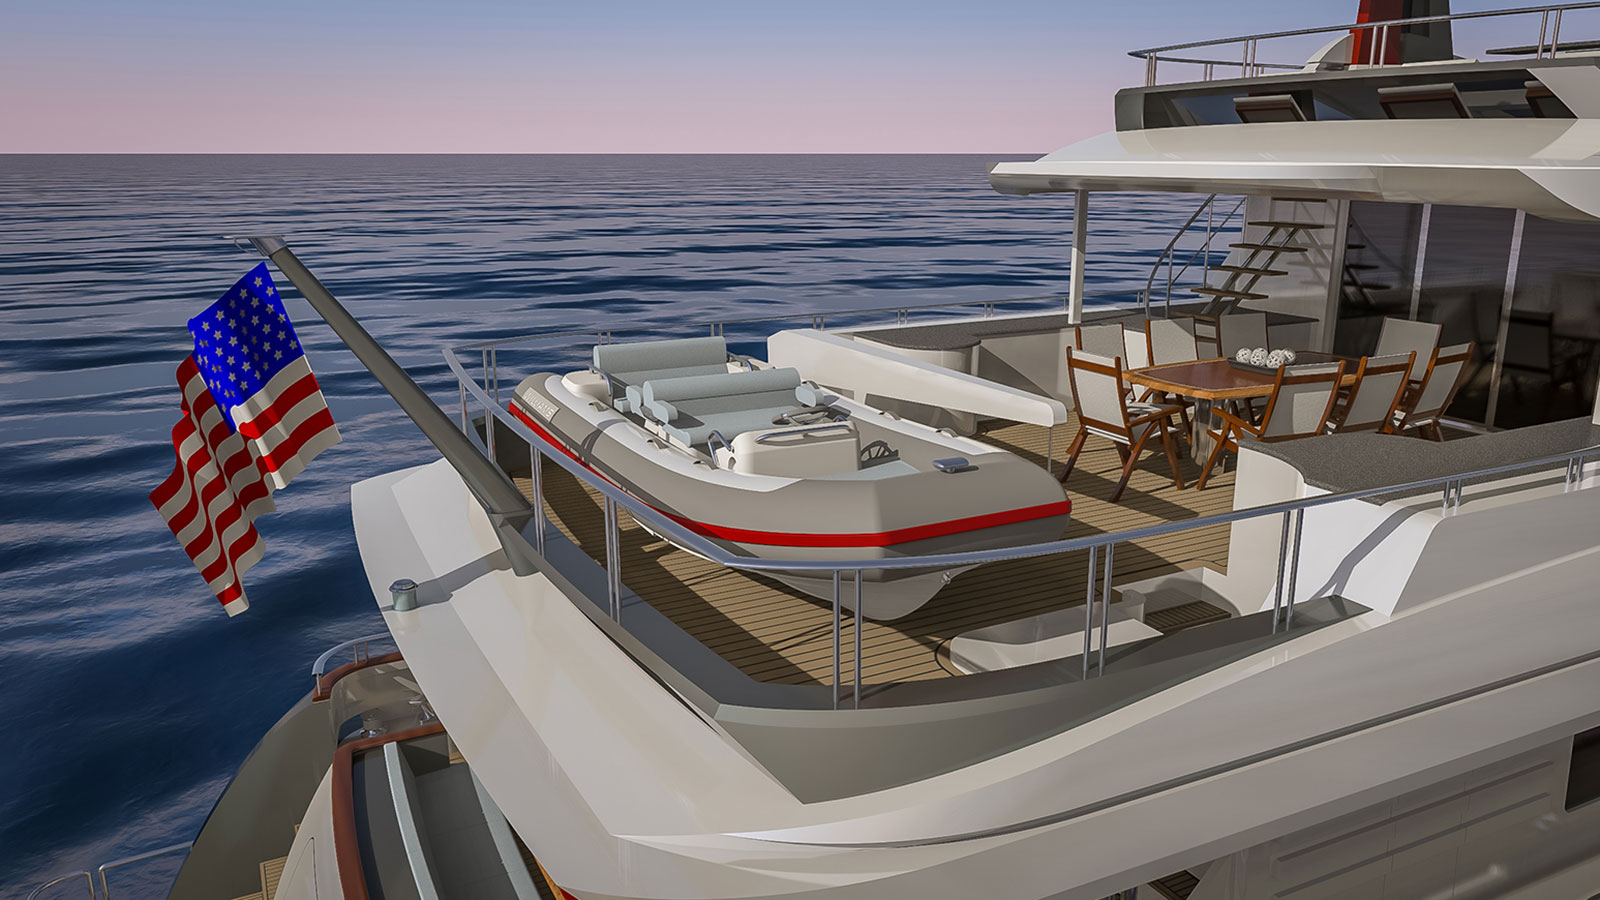 Outer Reef Trident 3000 bridge deck aft